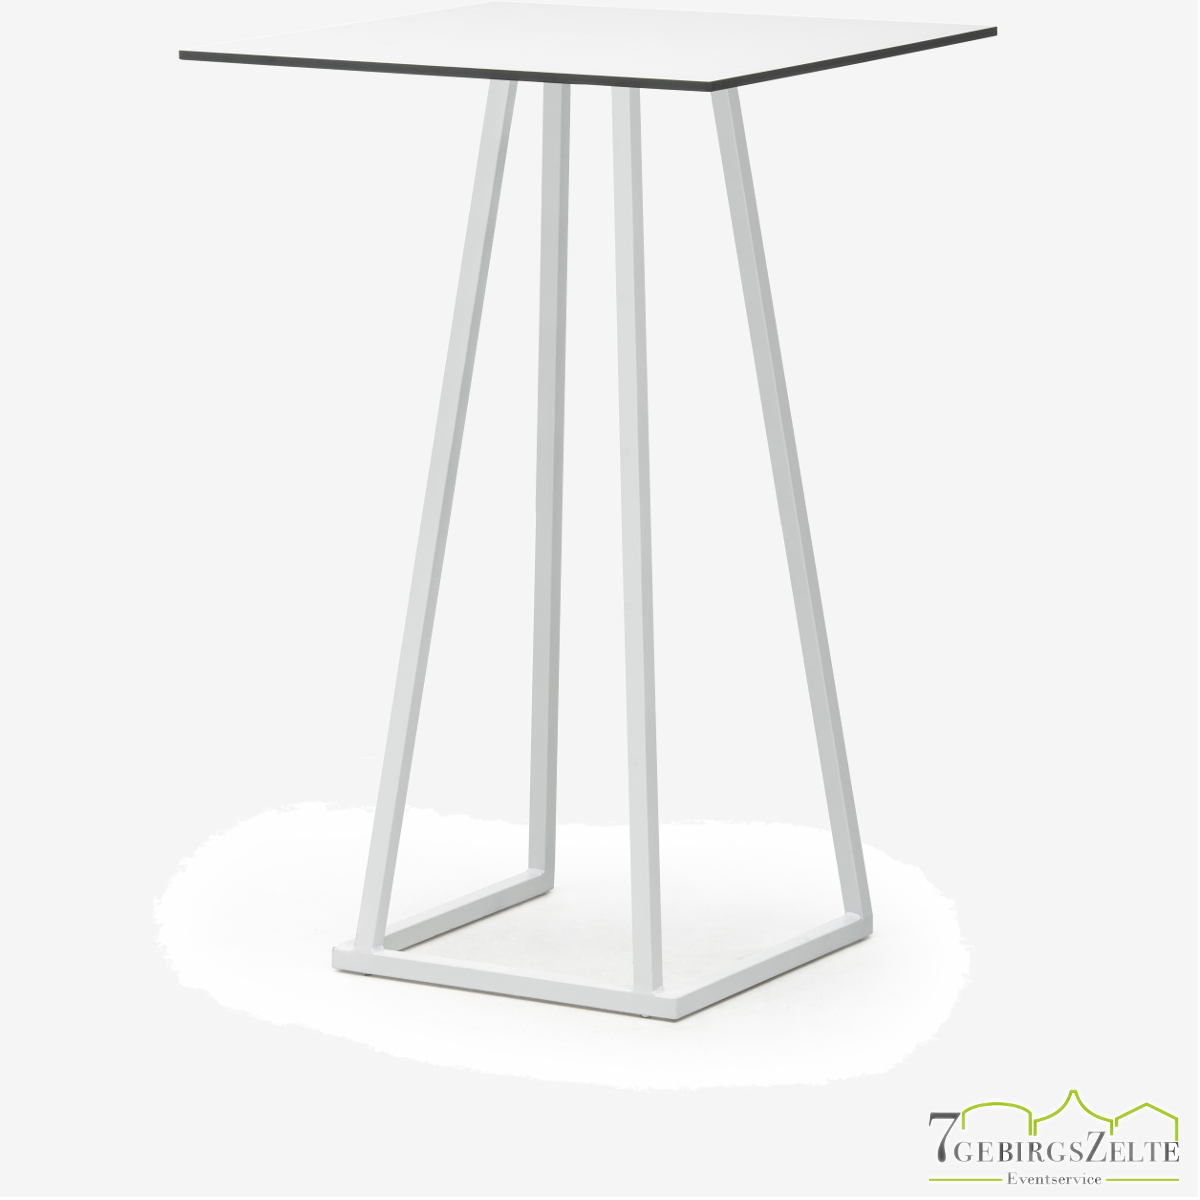 Linéa Party 70x70x110 - alu weiß  - Tischplatte Farbe variabel